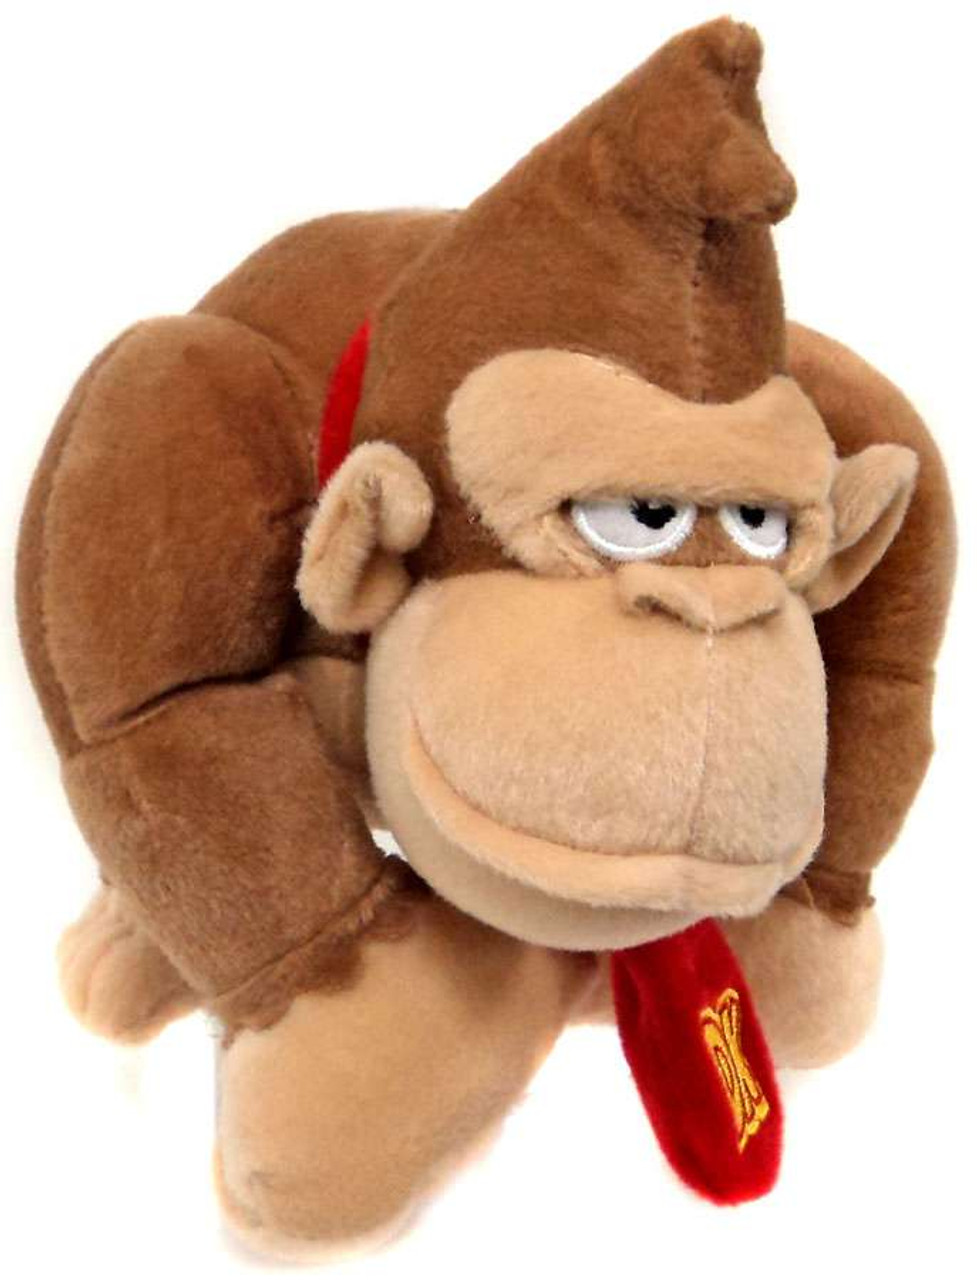 Super Mario Donkey Kong 6 inch Plush Toy